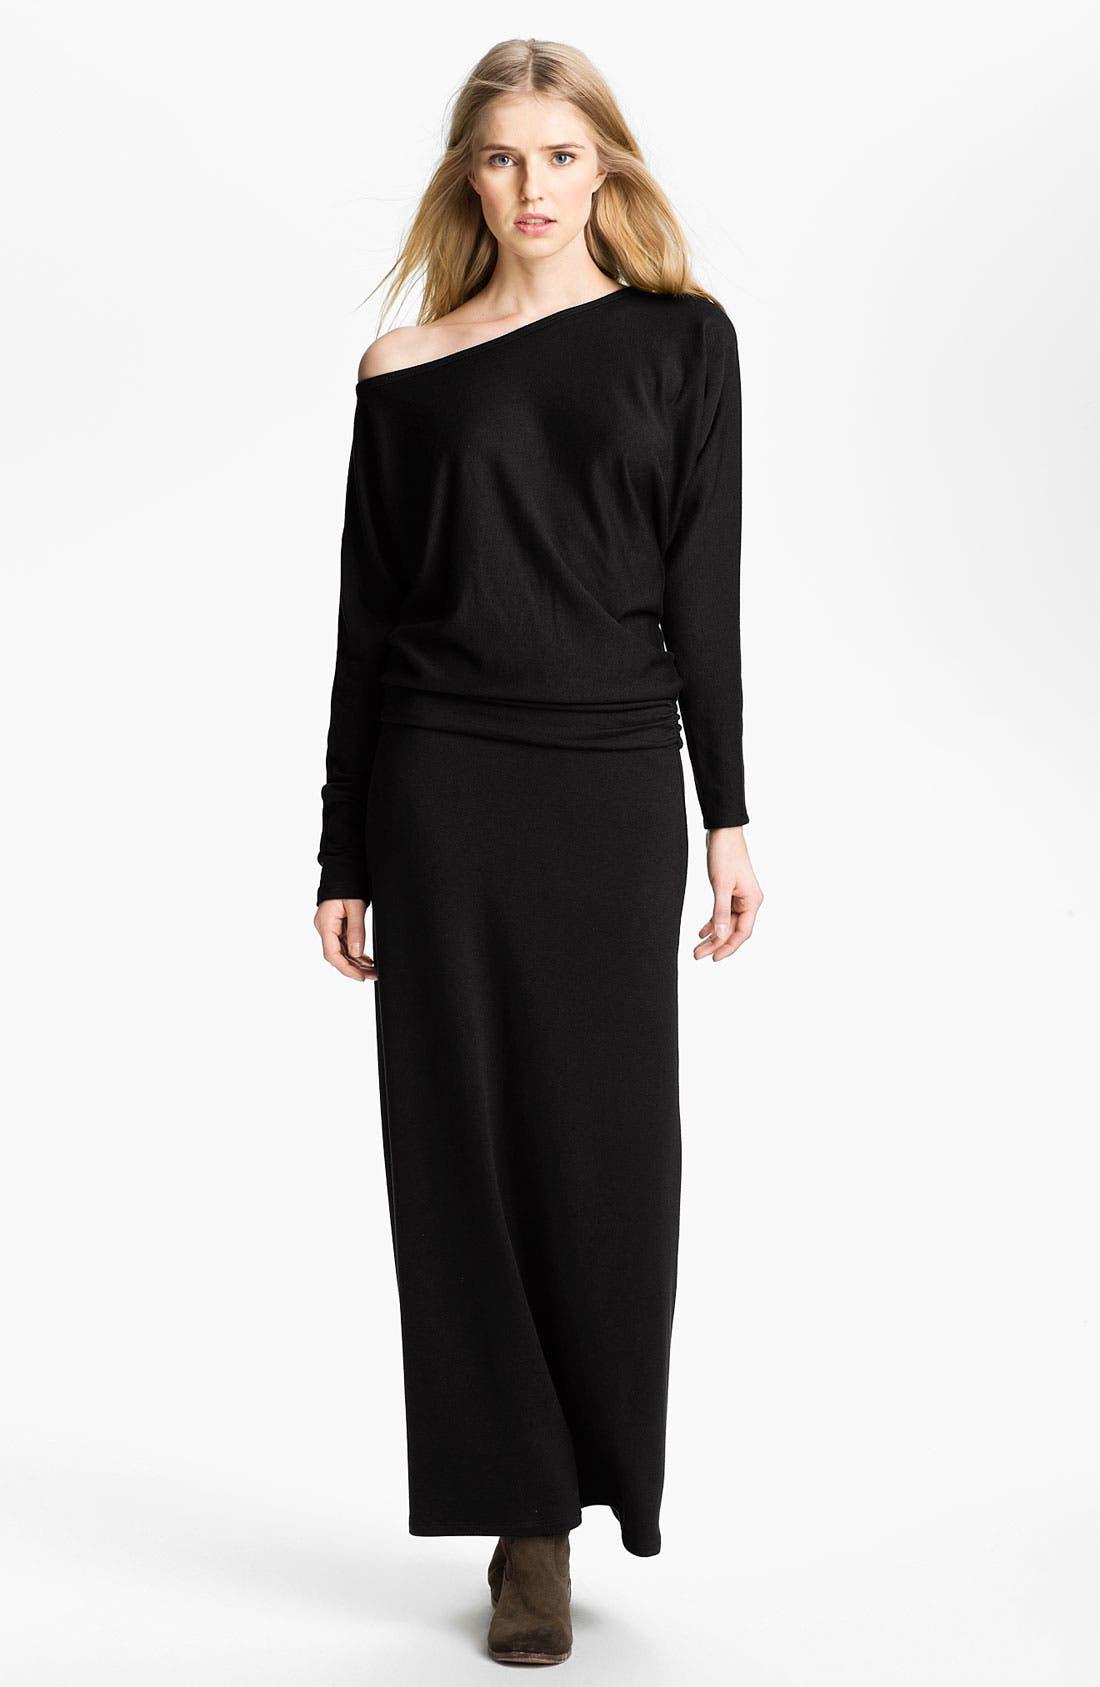 Alternate Image 1 Selected - Tart 'Yvonne' Off the Shoulder Sweater Maxi Dress